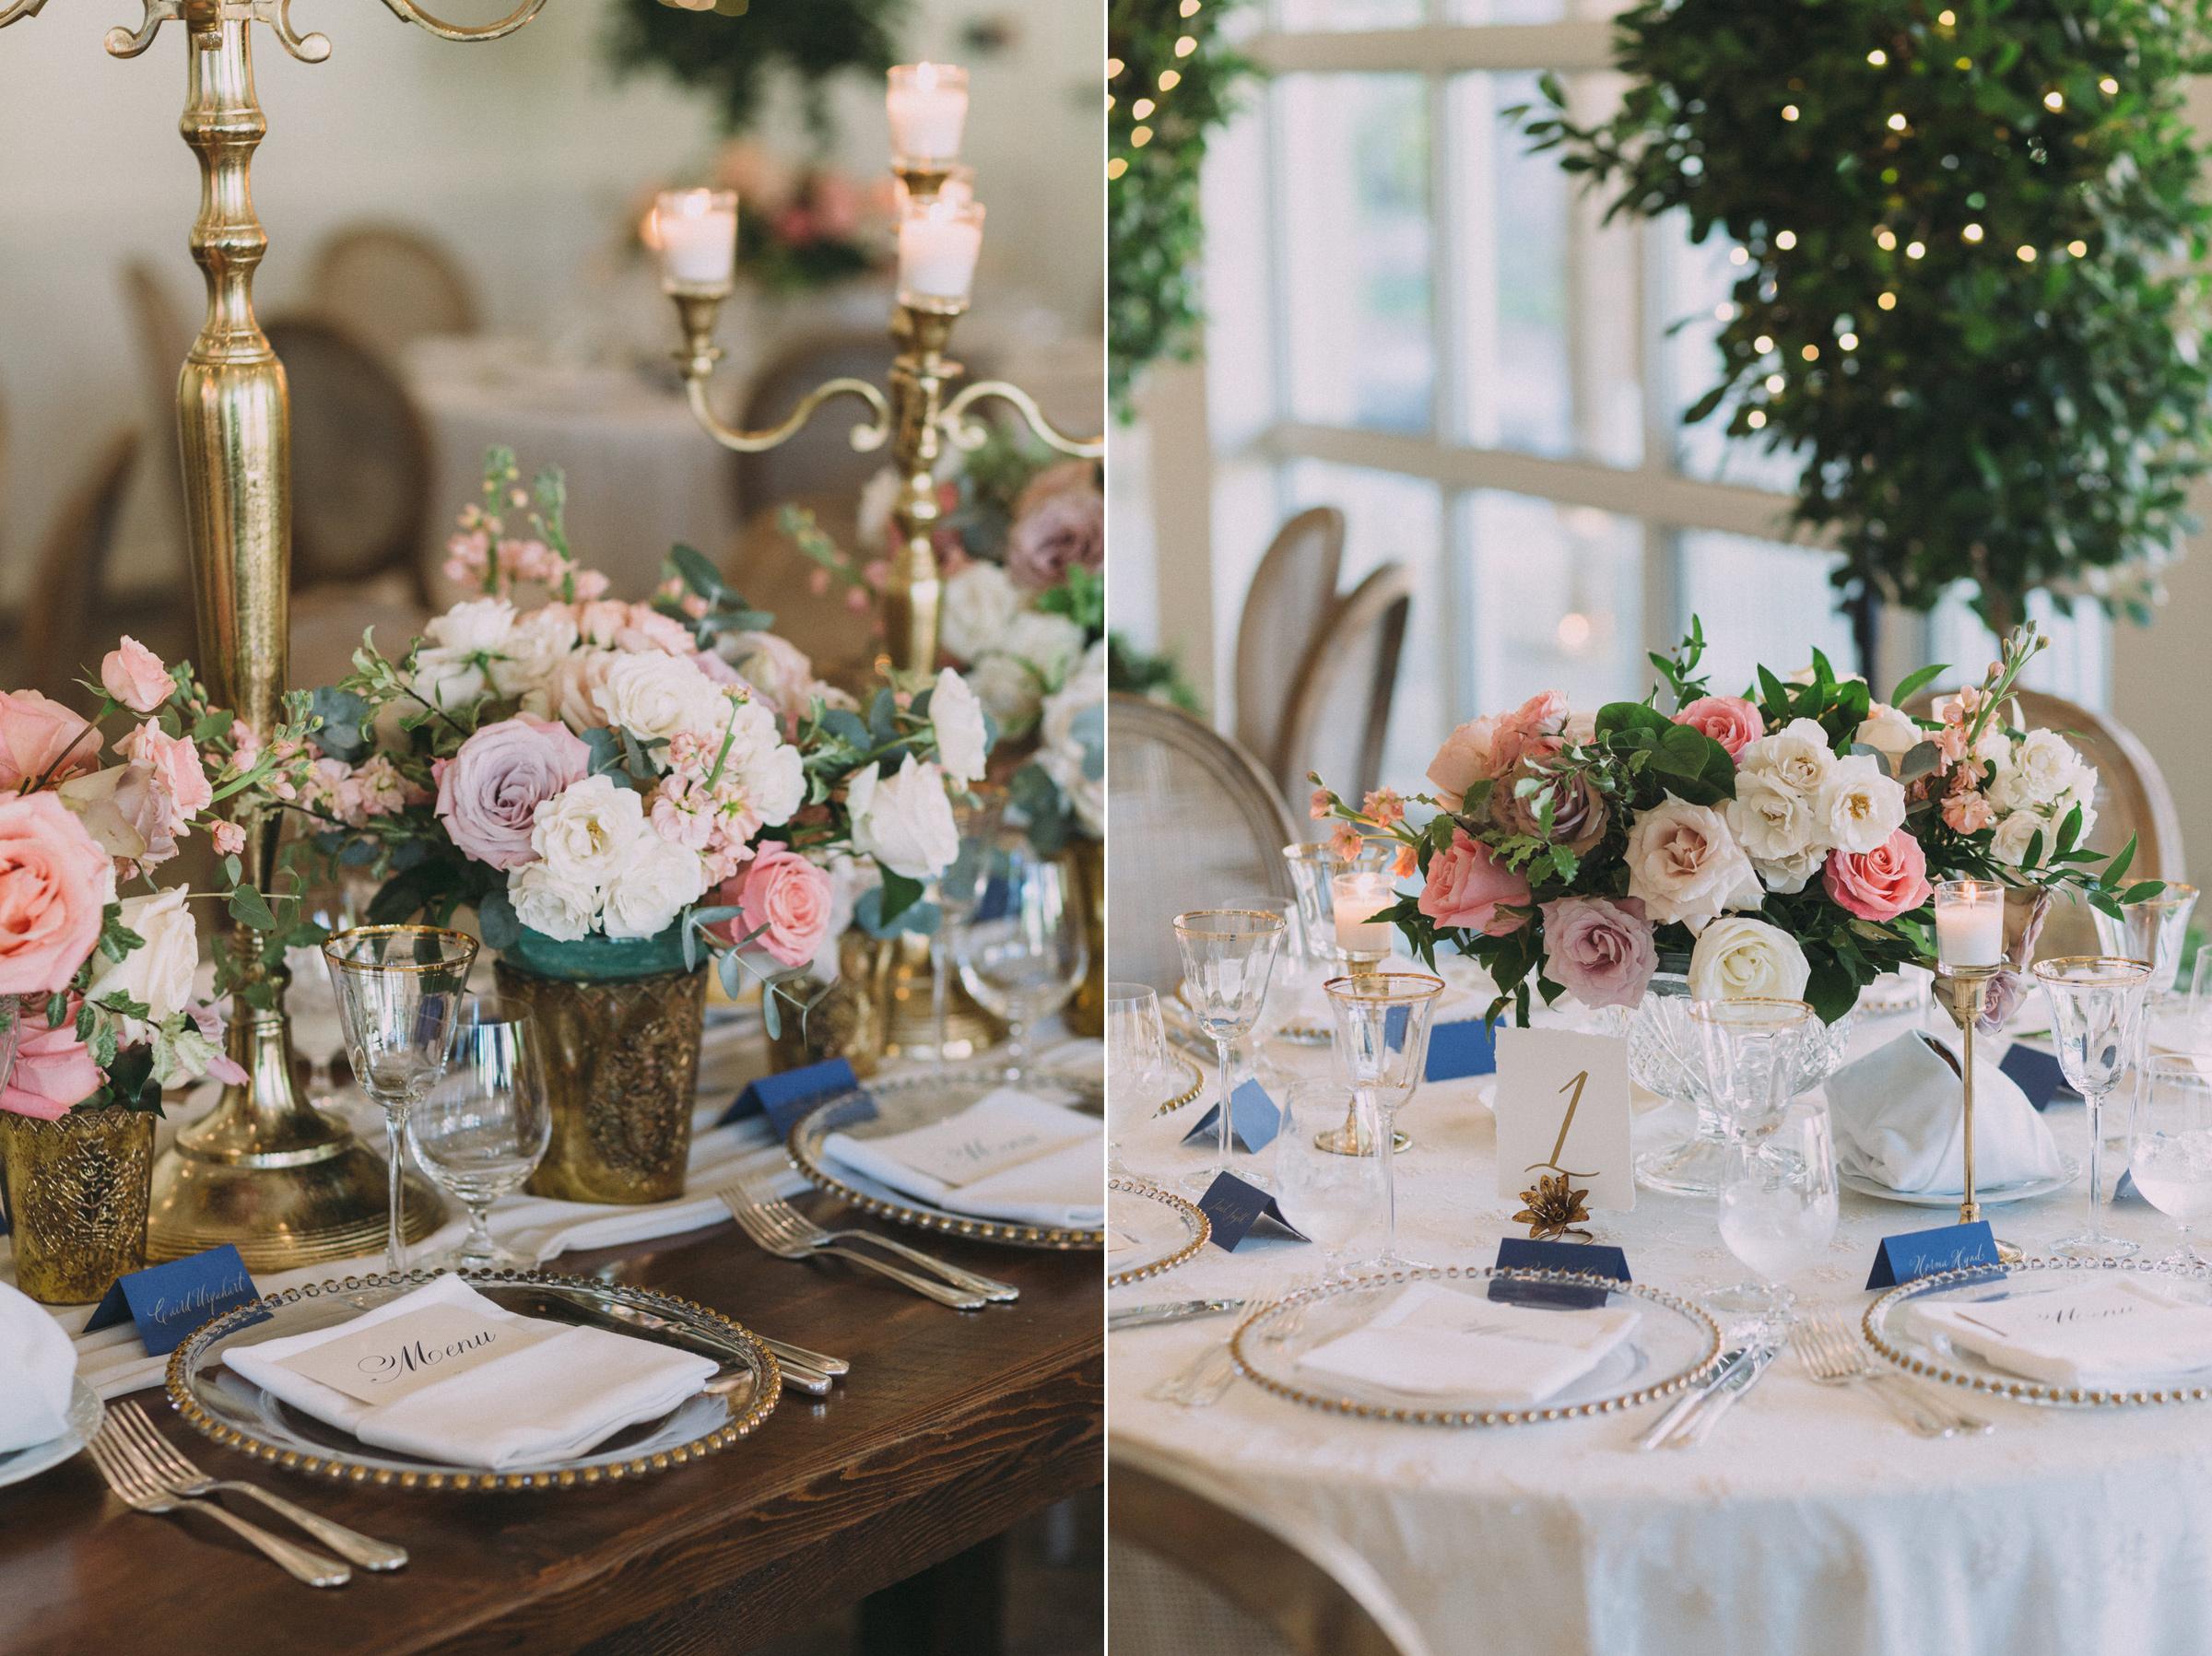 Langdon-Hall-wedding-photography-Cambridge-by-Sam-Wong-of-Visual-Cravings_Sarah-Ryan_49.jpg